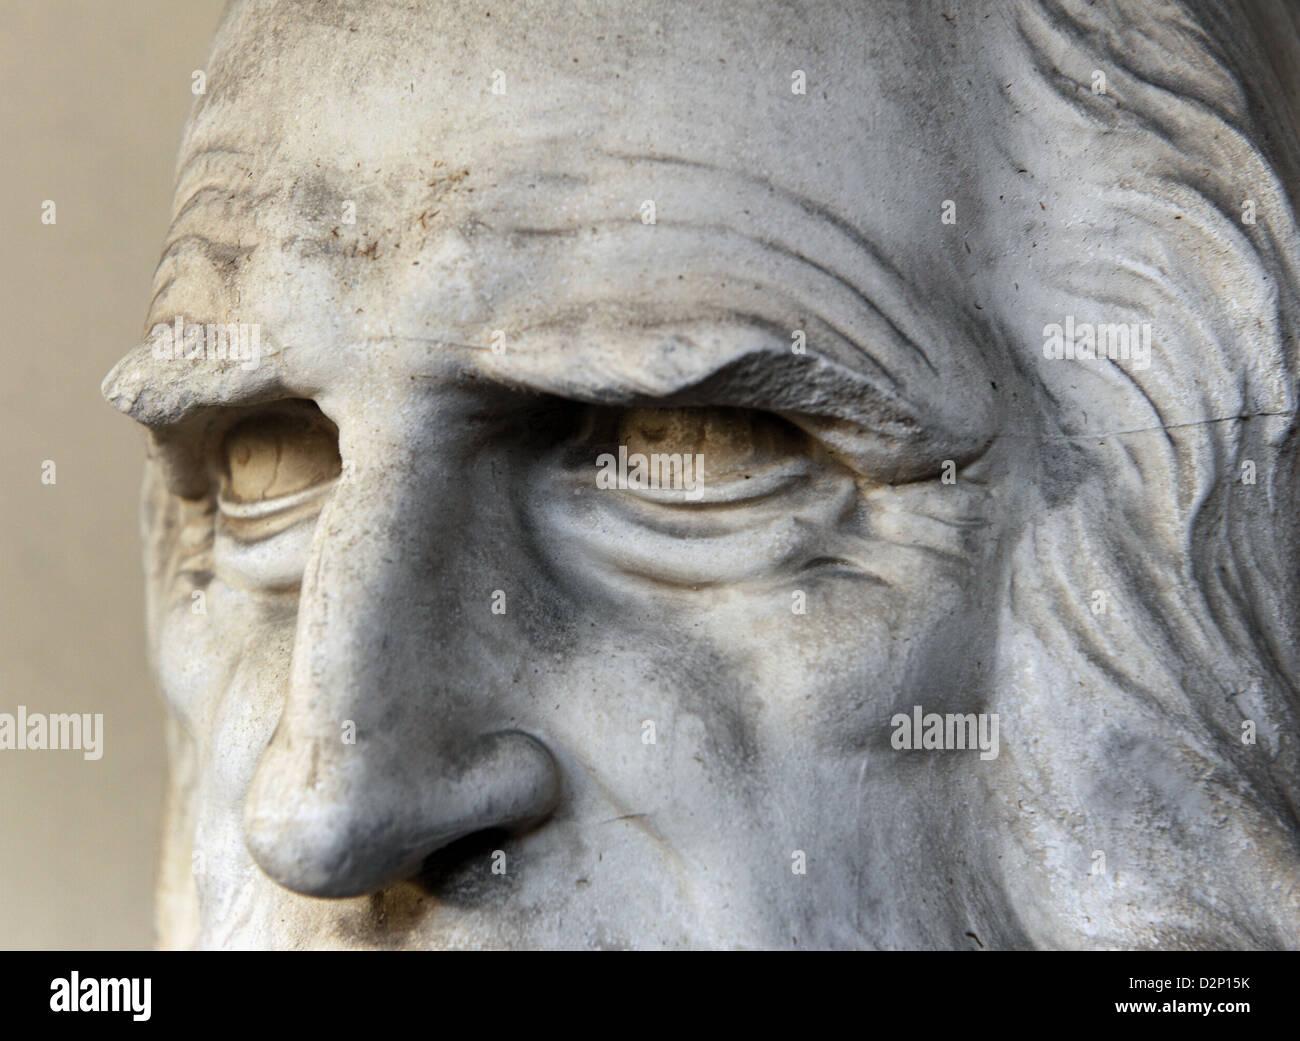 Leonardo da Vinci (1452-1519). El polímata renacentista italiano. Busto. Detalle. Patio de la pinacoteca Ambrosiana. Imagen De Stock